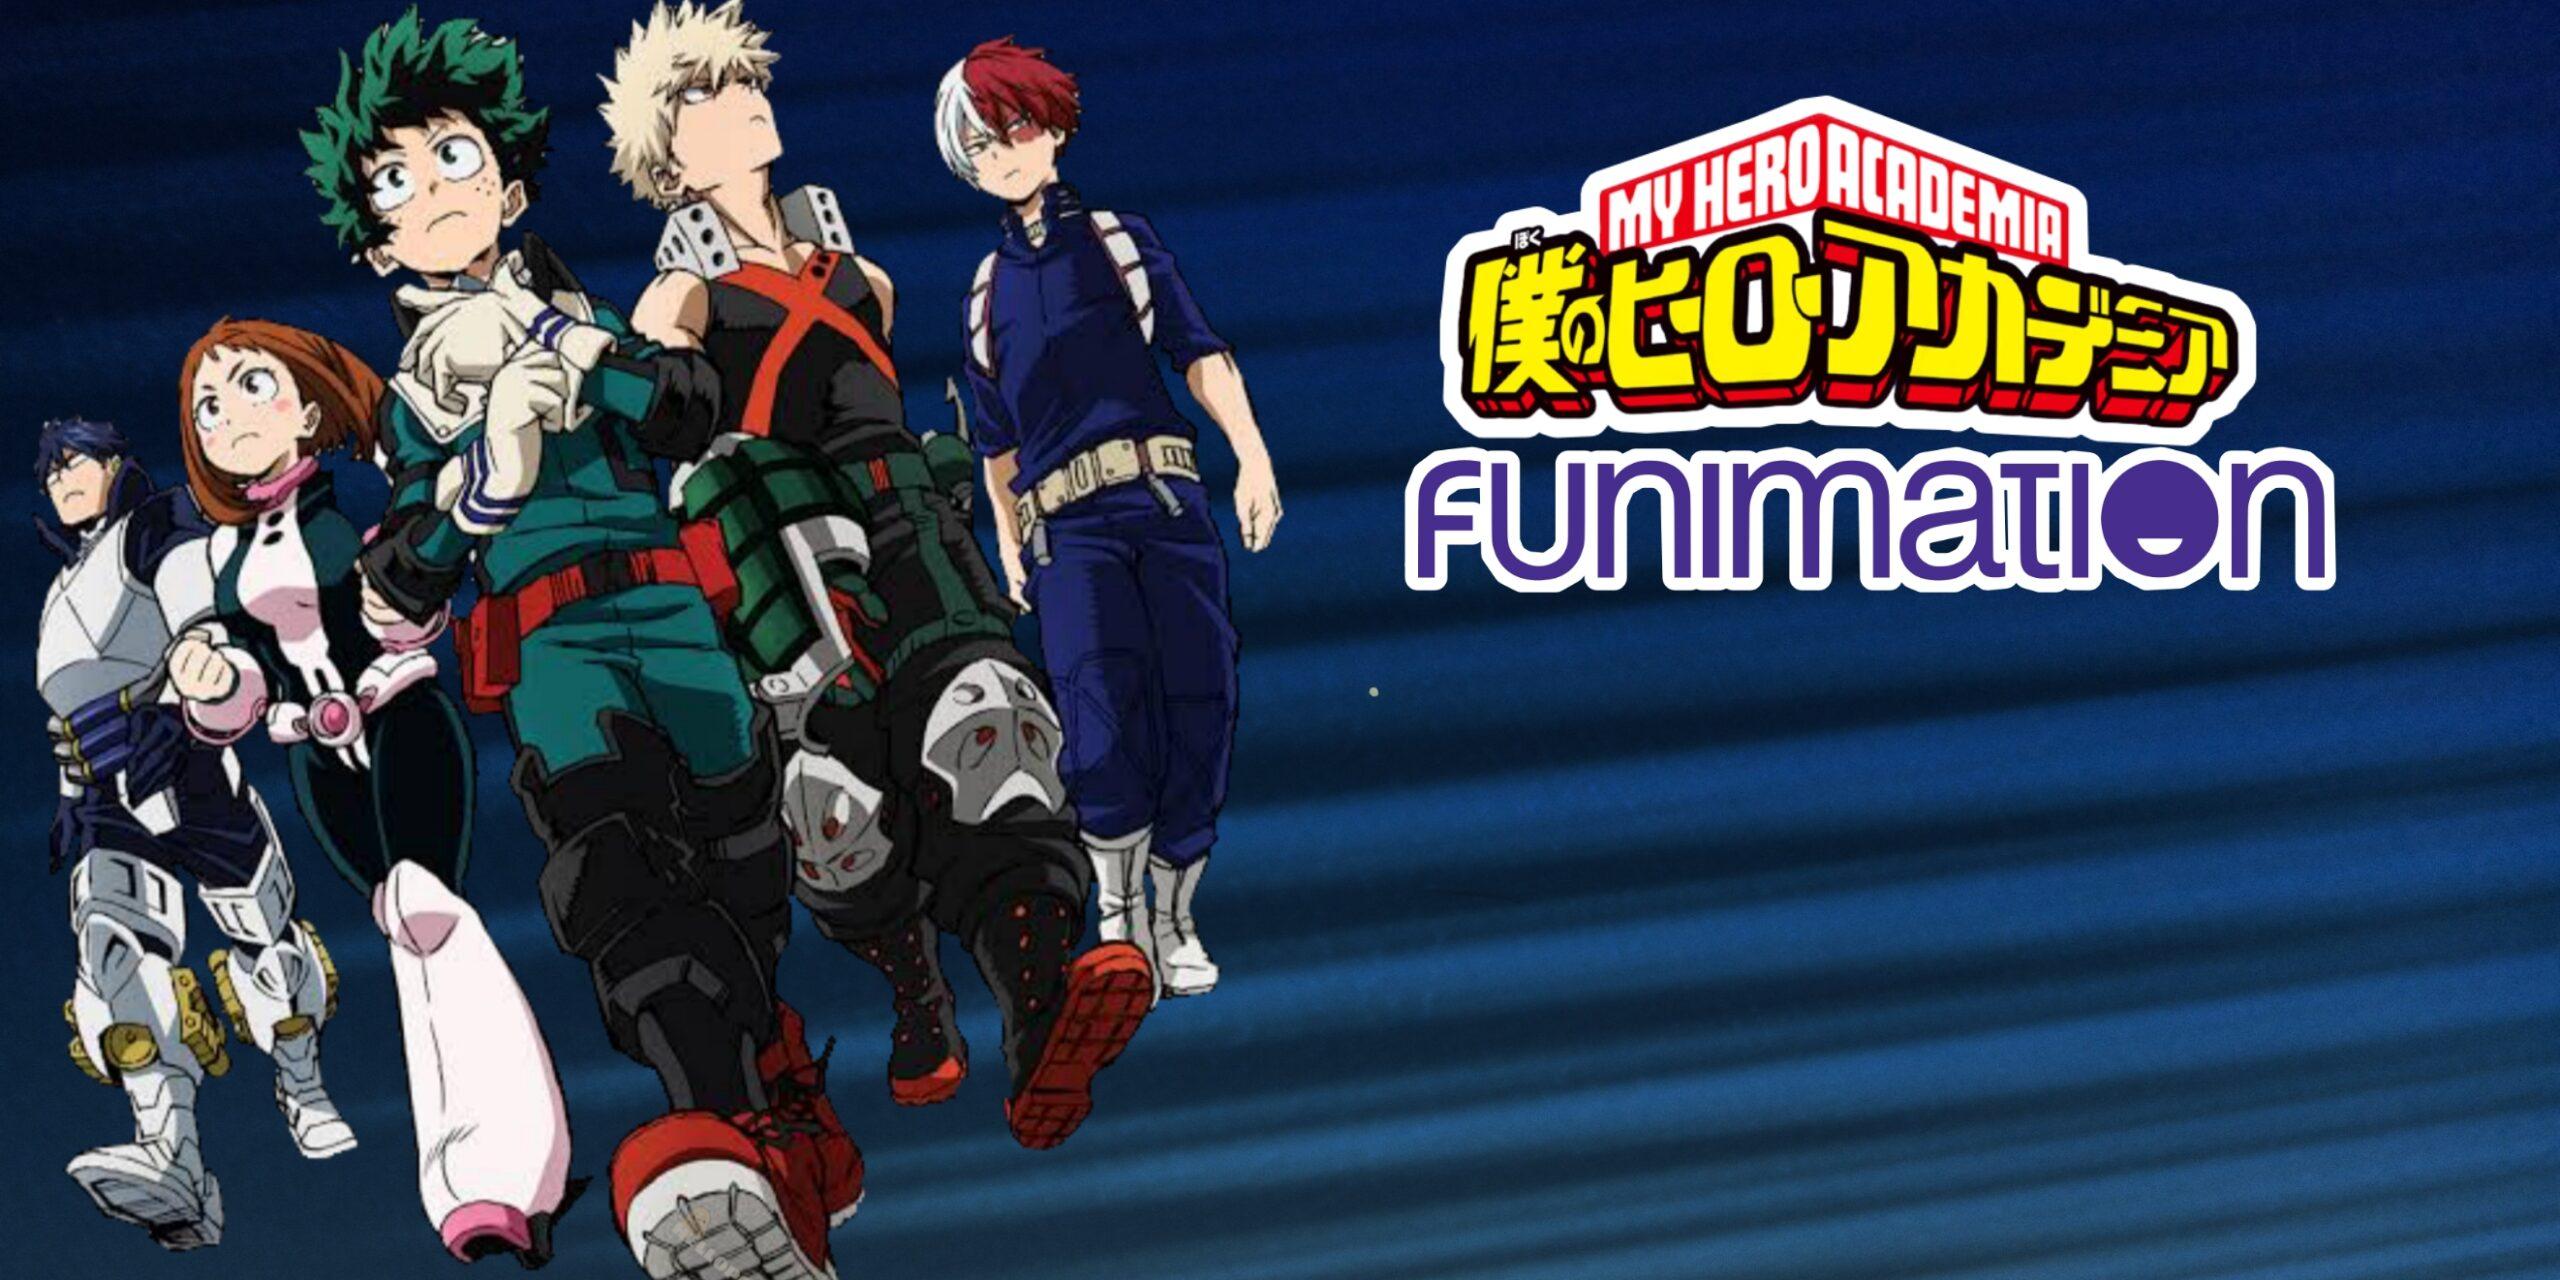 Foto de My Hero Academia vai estar no catálogo da Funimation Br, e…